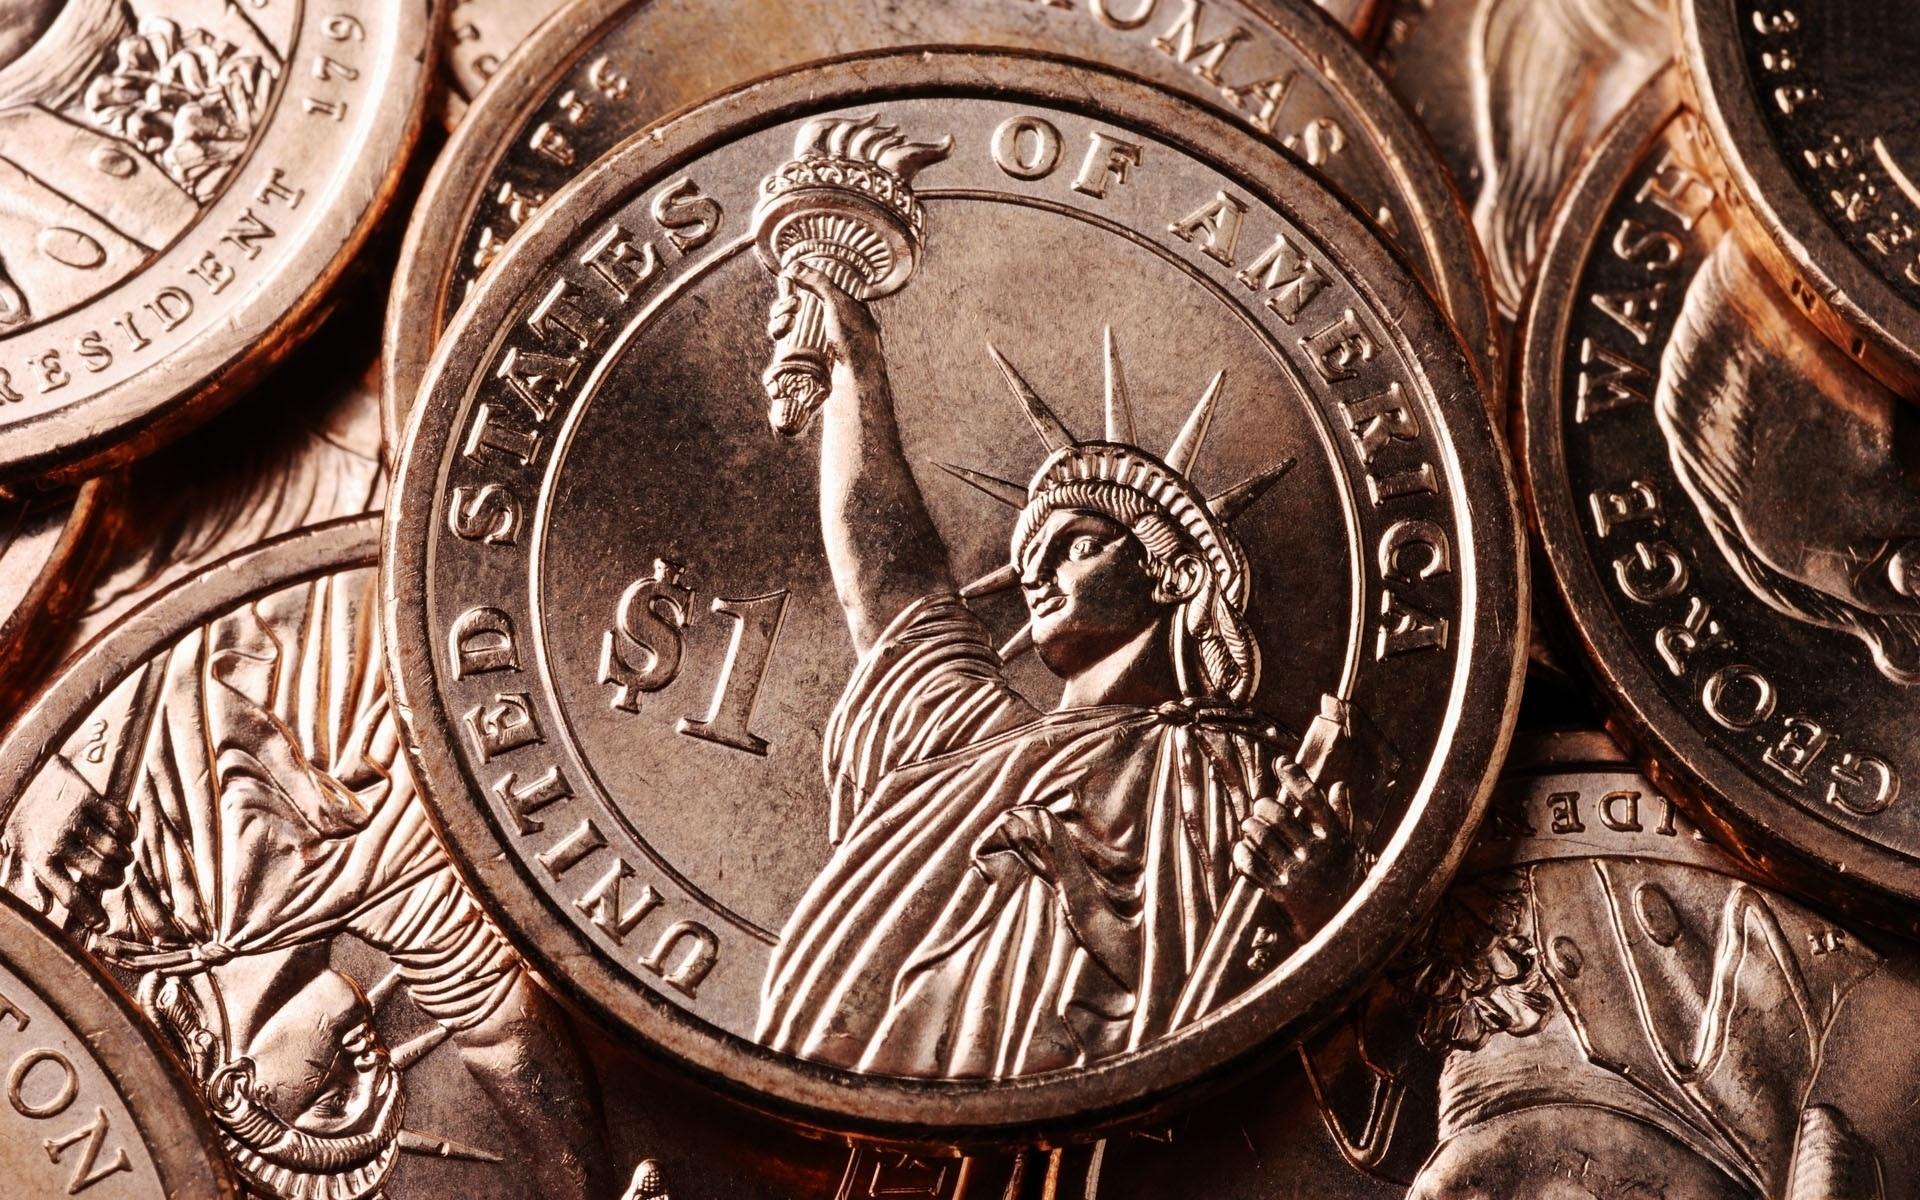 Фото монет на рабочий стол